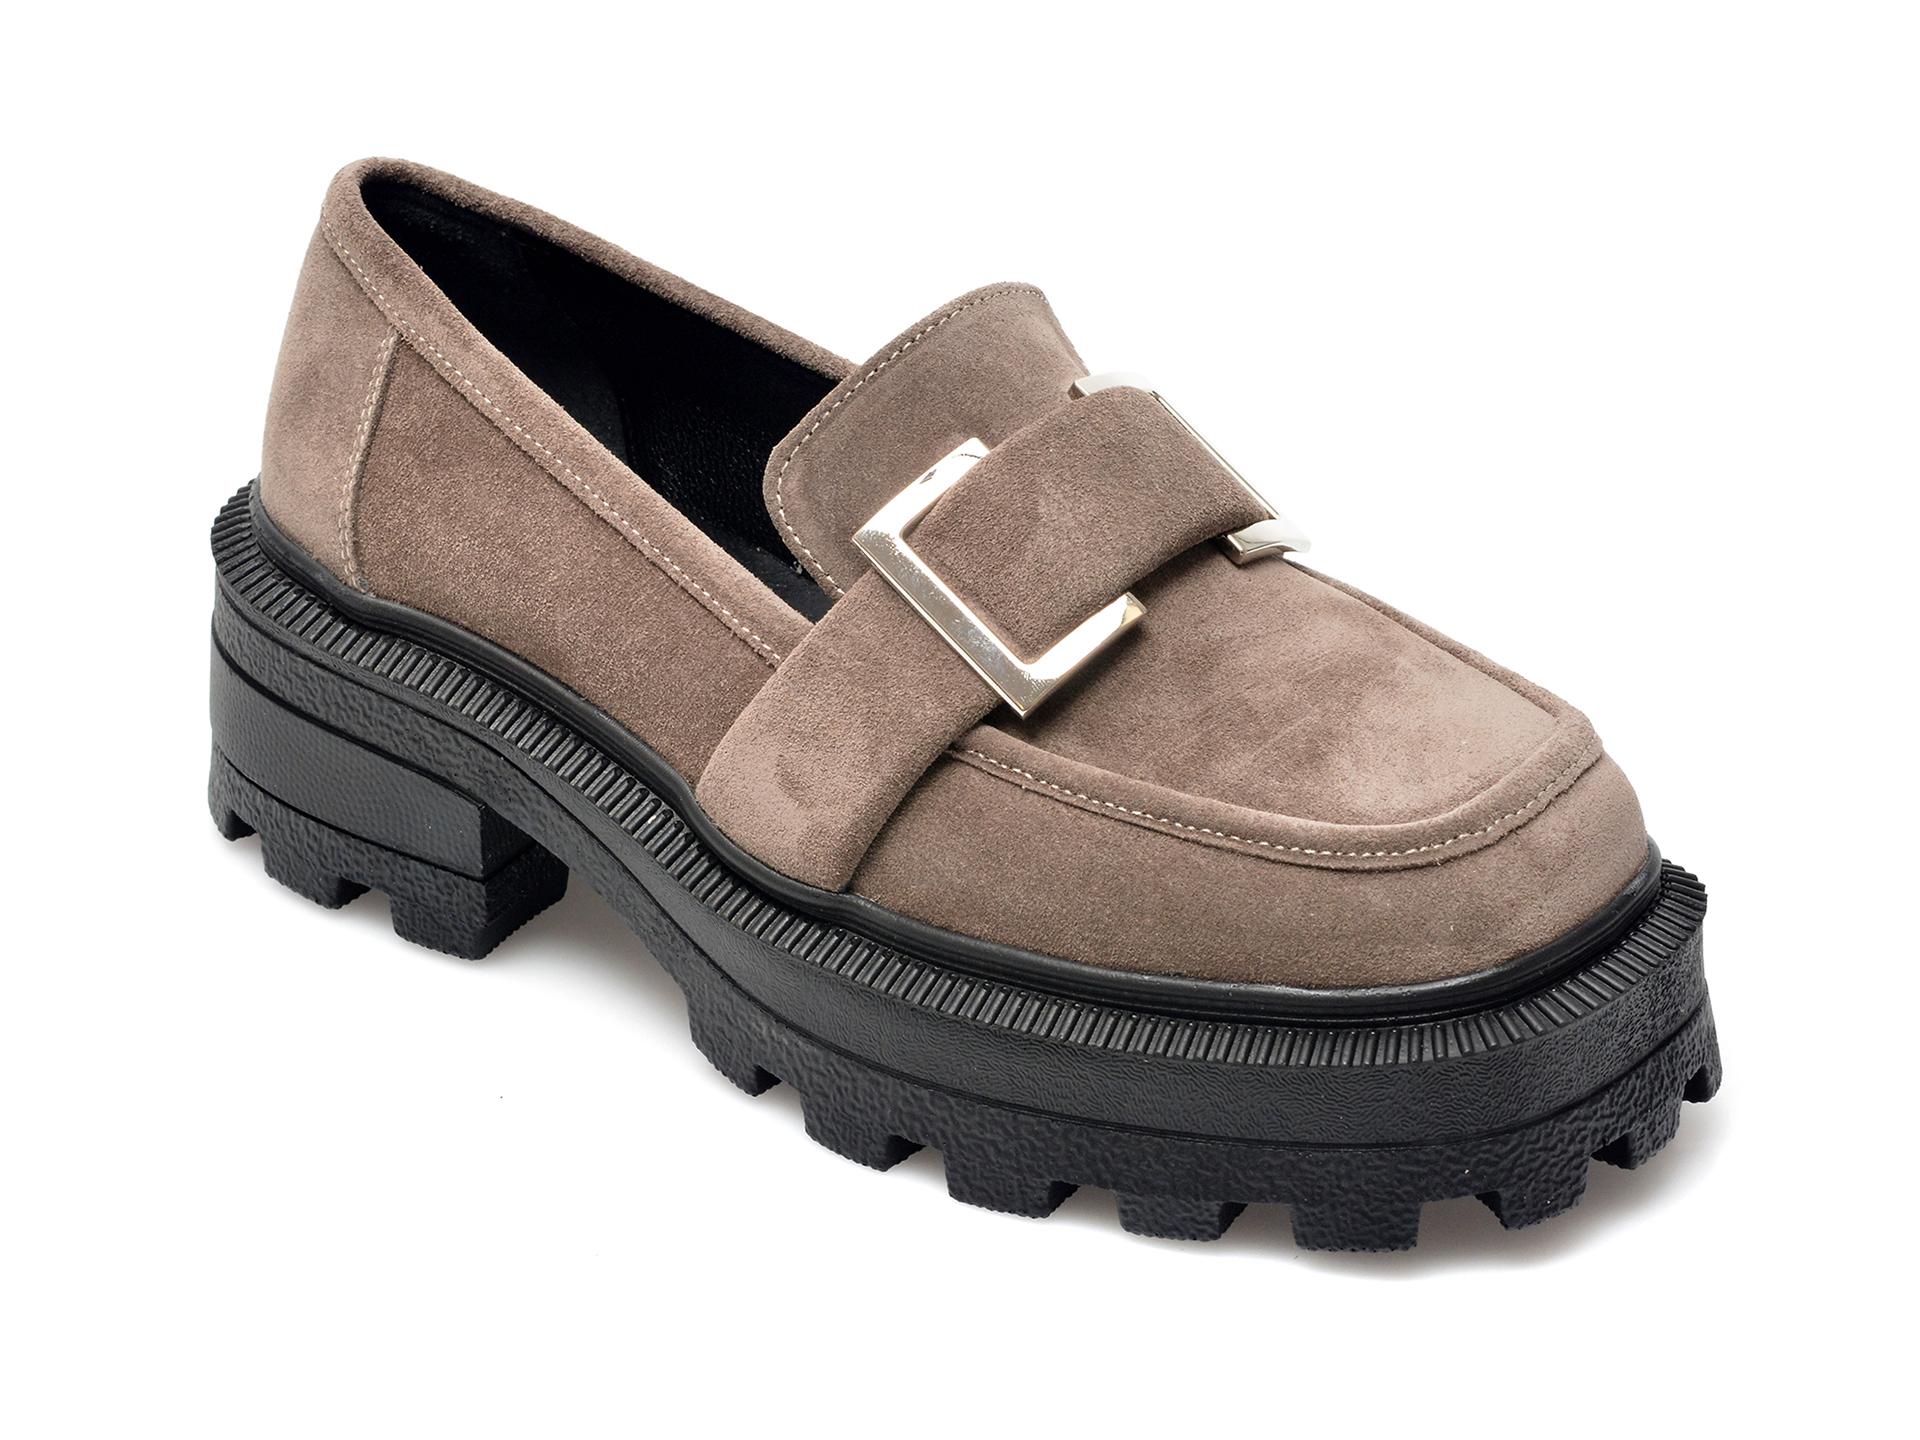 Pantofi EPICA gri, 21748, din piele intoarsa imagine otter.ro 2021